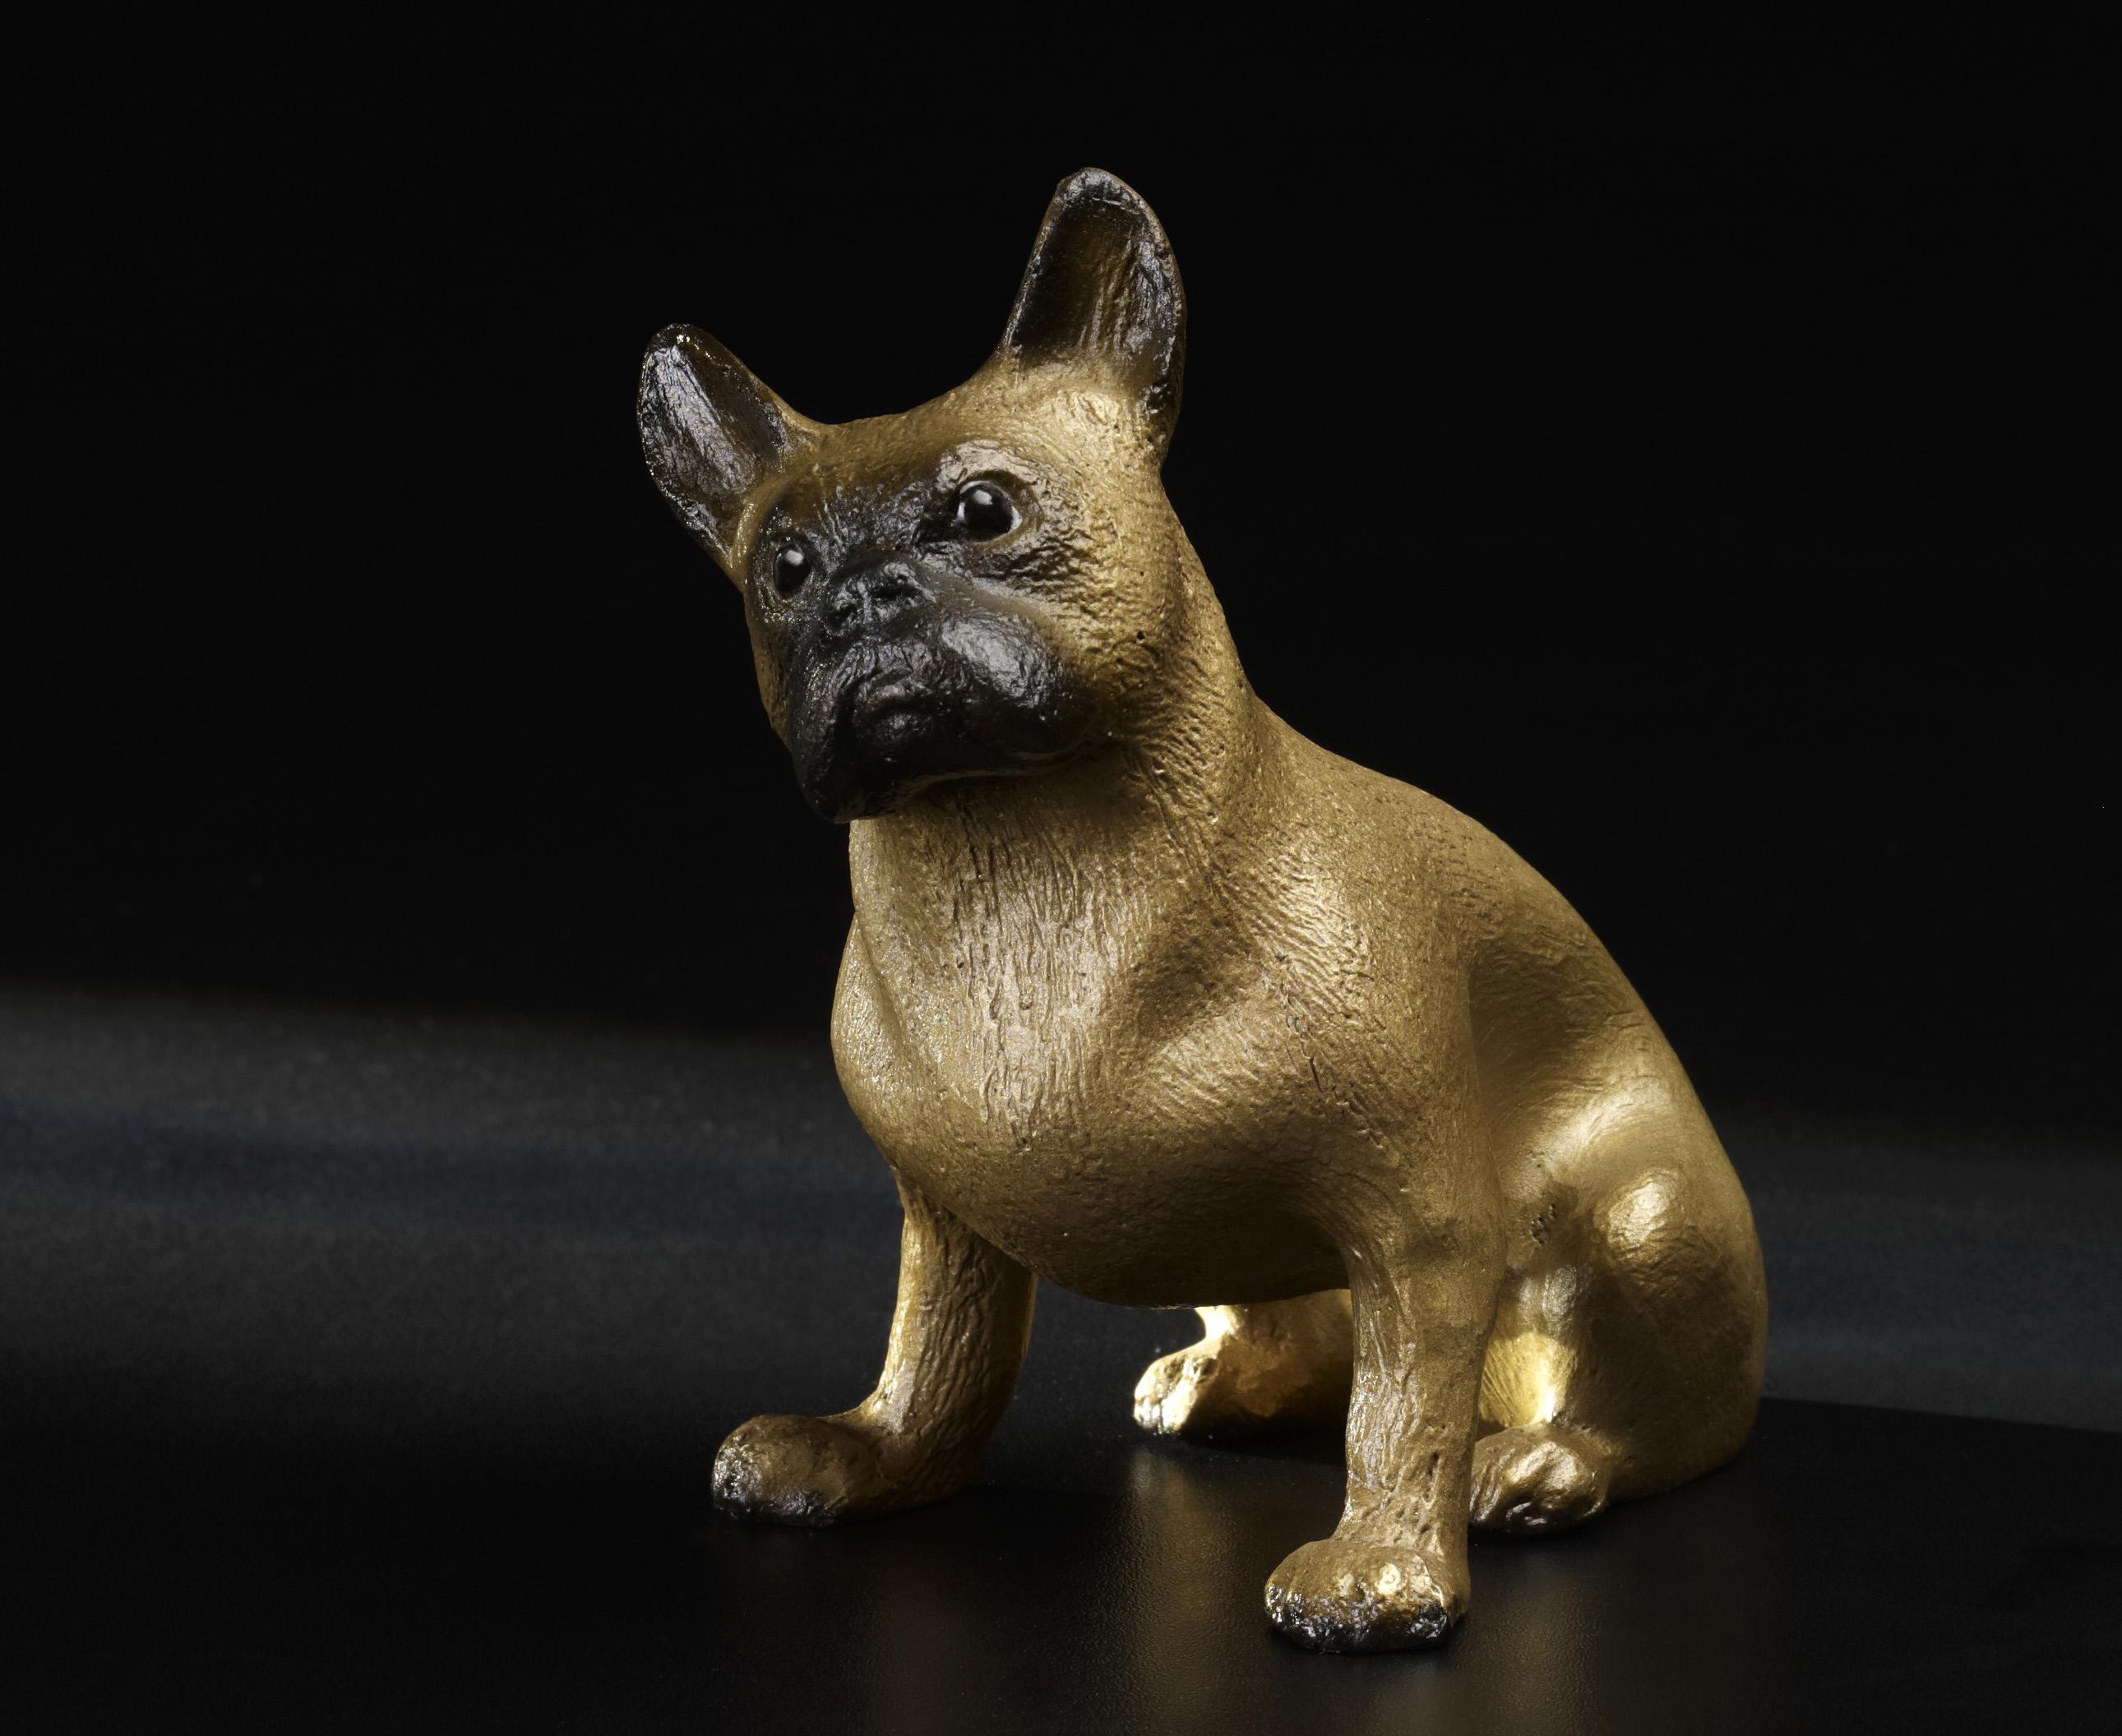 franz sische bulldogge bronze kunstwerkst tte. Black Bedroom Furniture Sets. Home Design Ideas